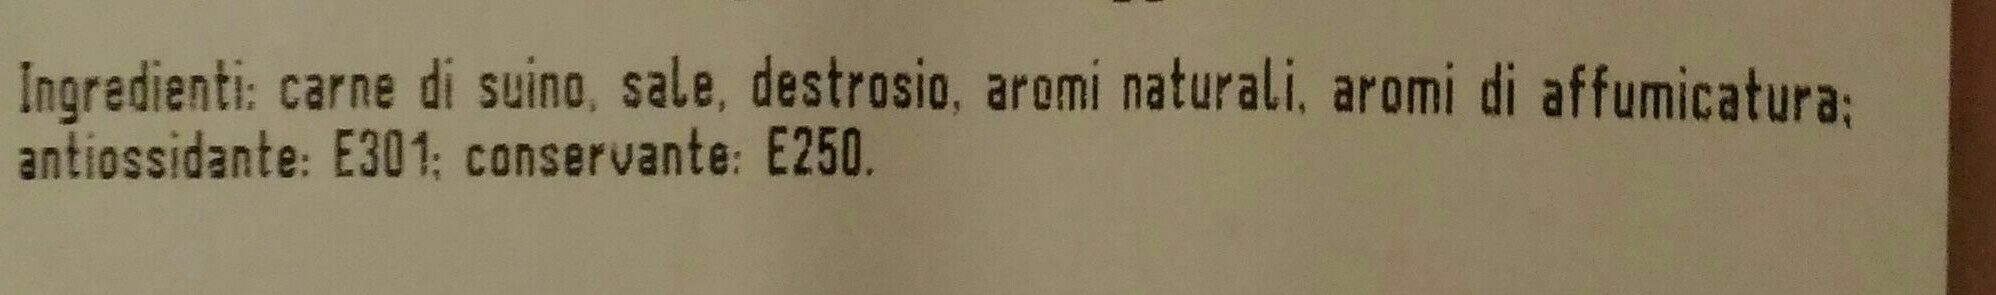 Prosciutto cotto Praga - Ingredients - it